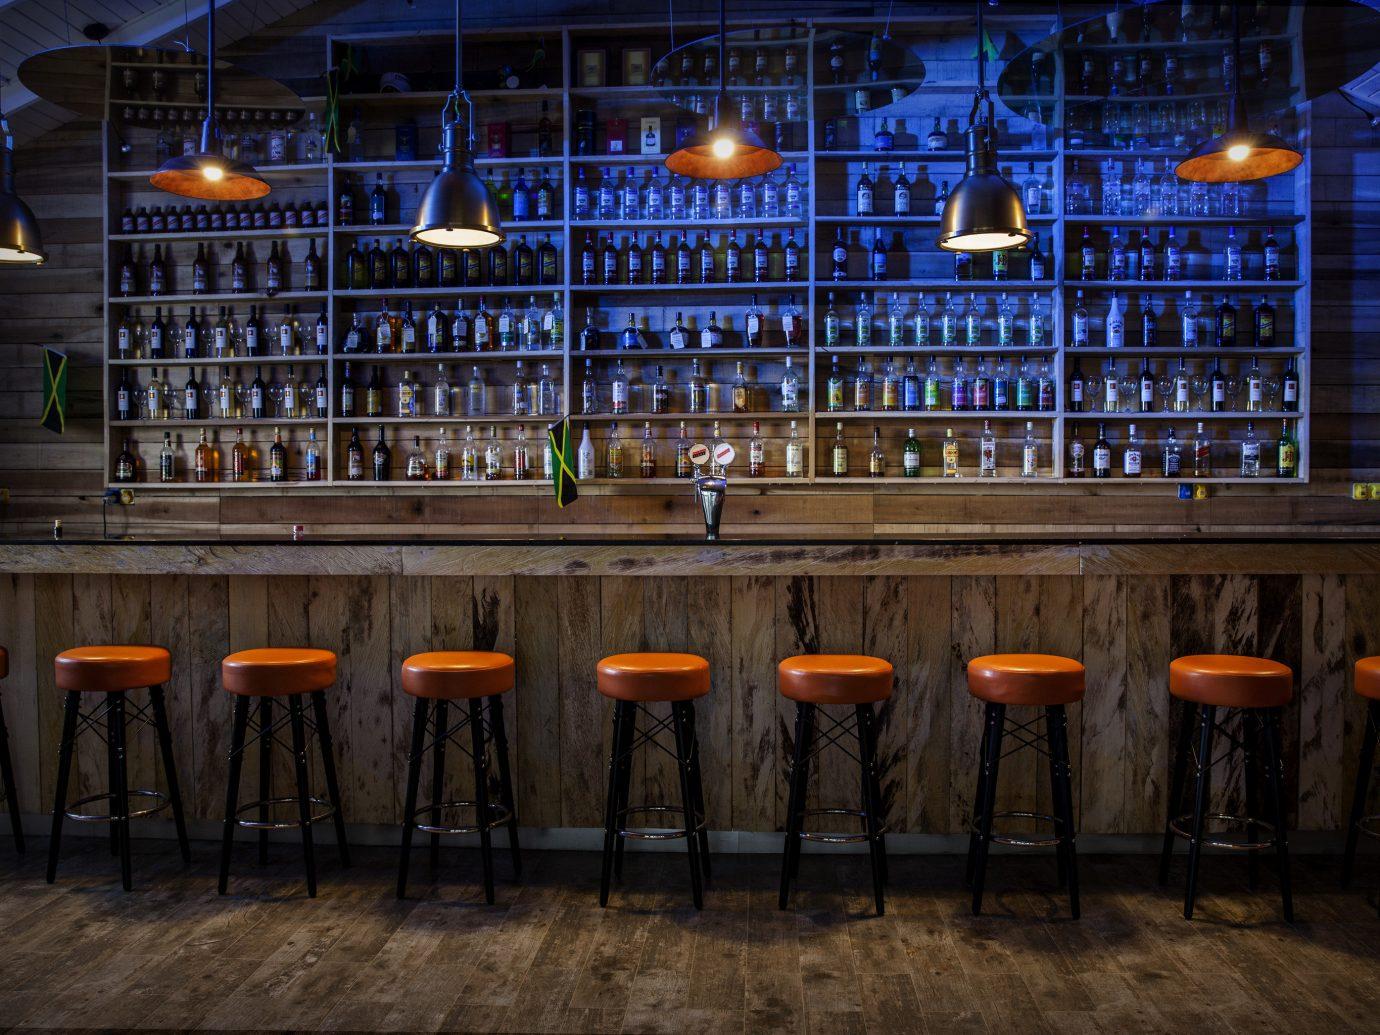 Hotels floor night Bar stage screenshot theatre